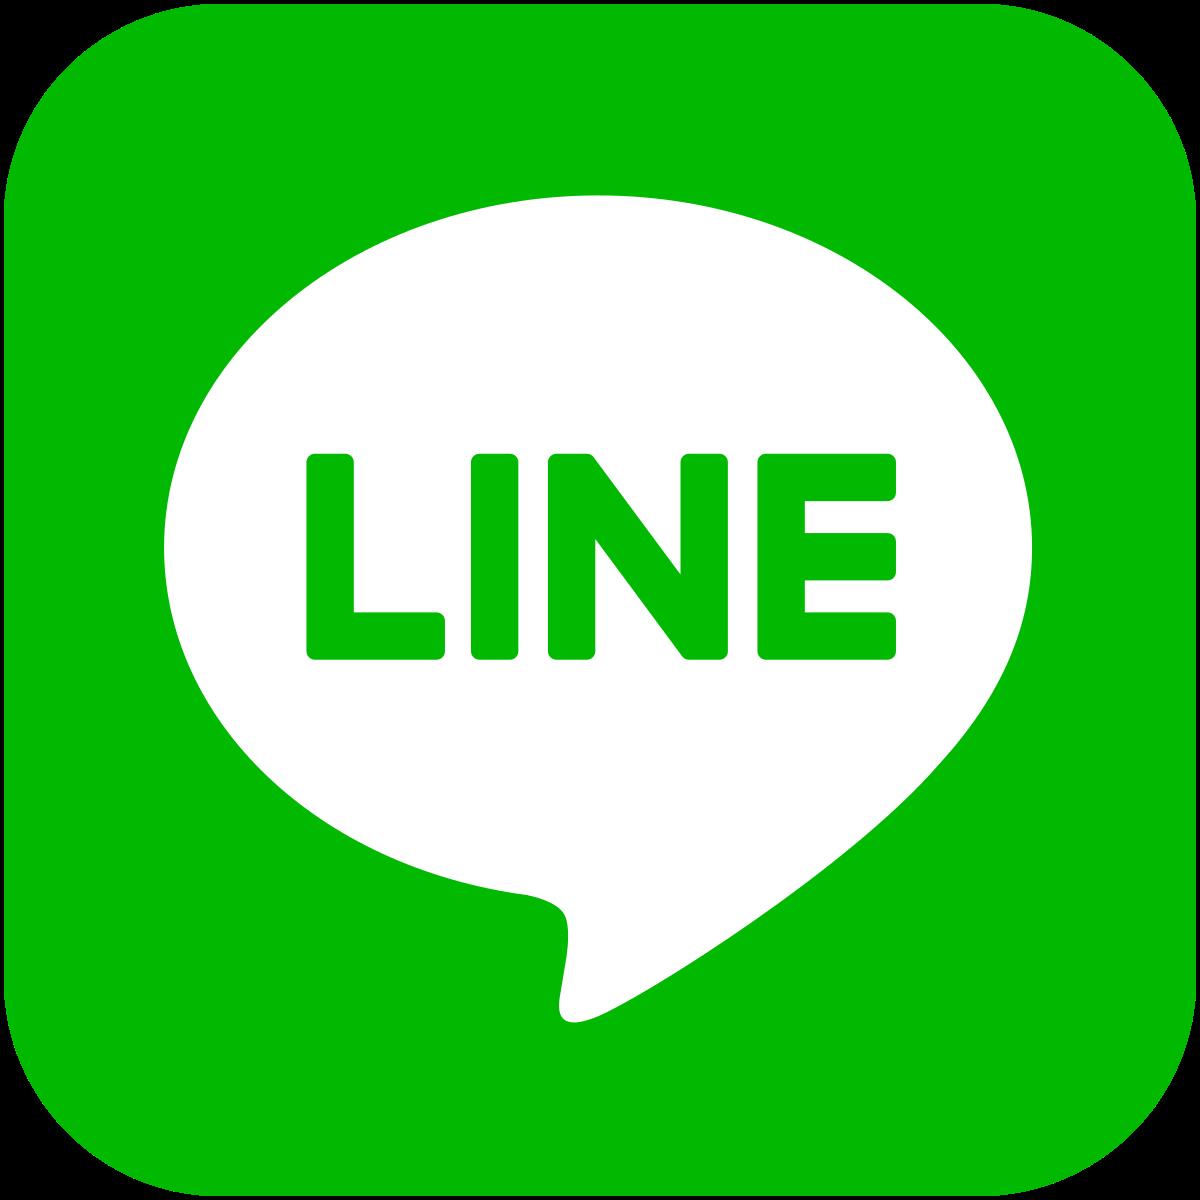 LINE (アプリケーション) - Wikipedia